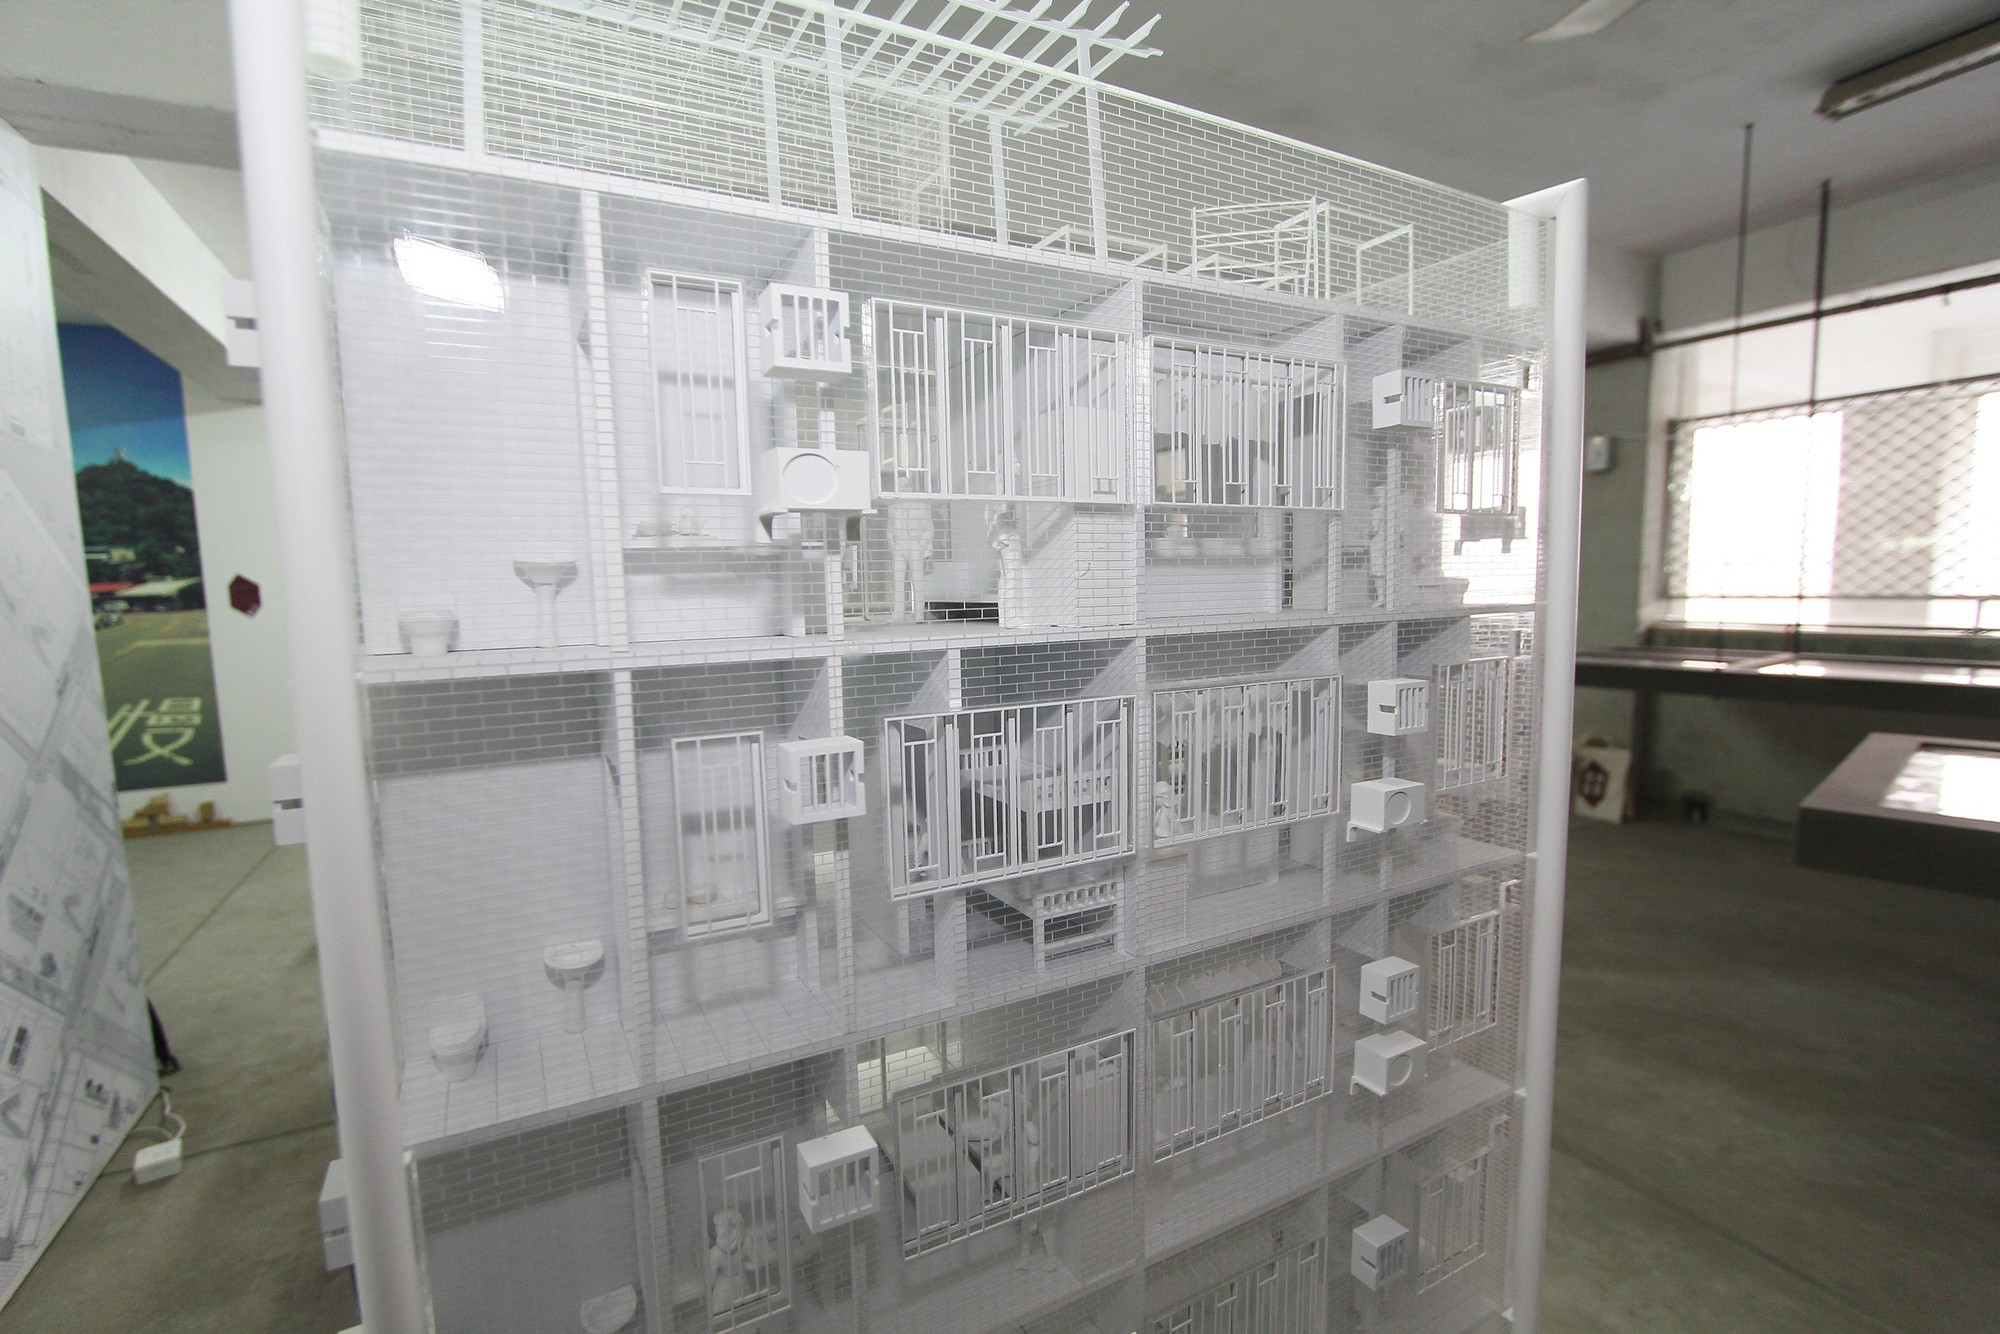 Merveilleux 2013 Hong Kong Biennale, UABB (Bi City Biennale Of Urbanism /Architecture)    ArchDaily